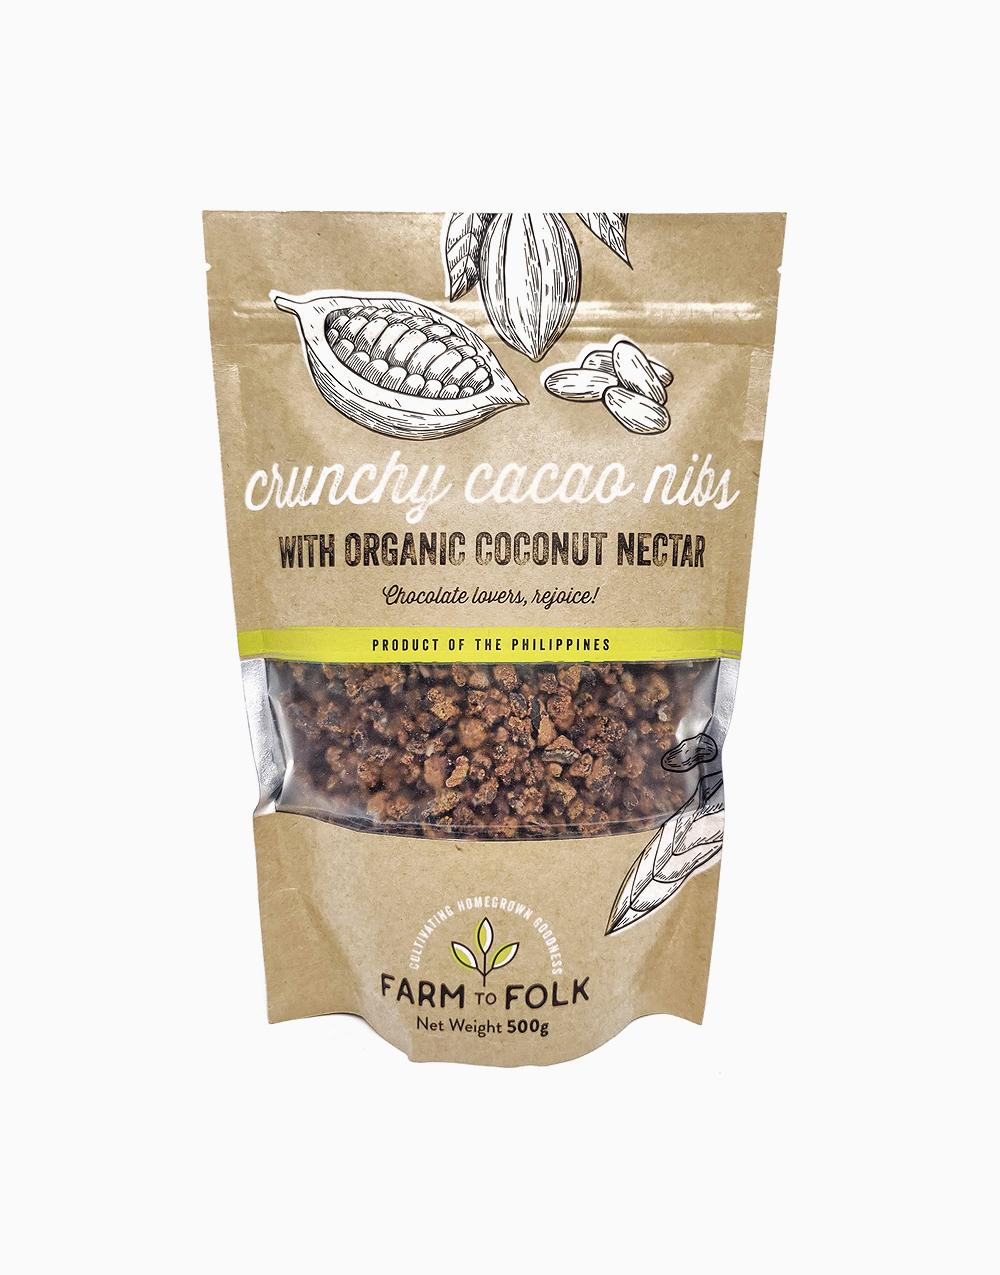 Crunchy Cacao Nibs with Organic Coconut Nectar (500g) by Farm to Folk